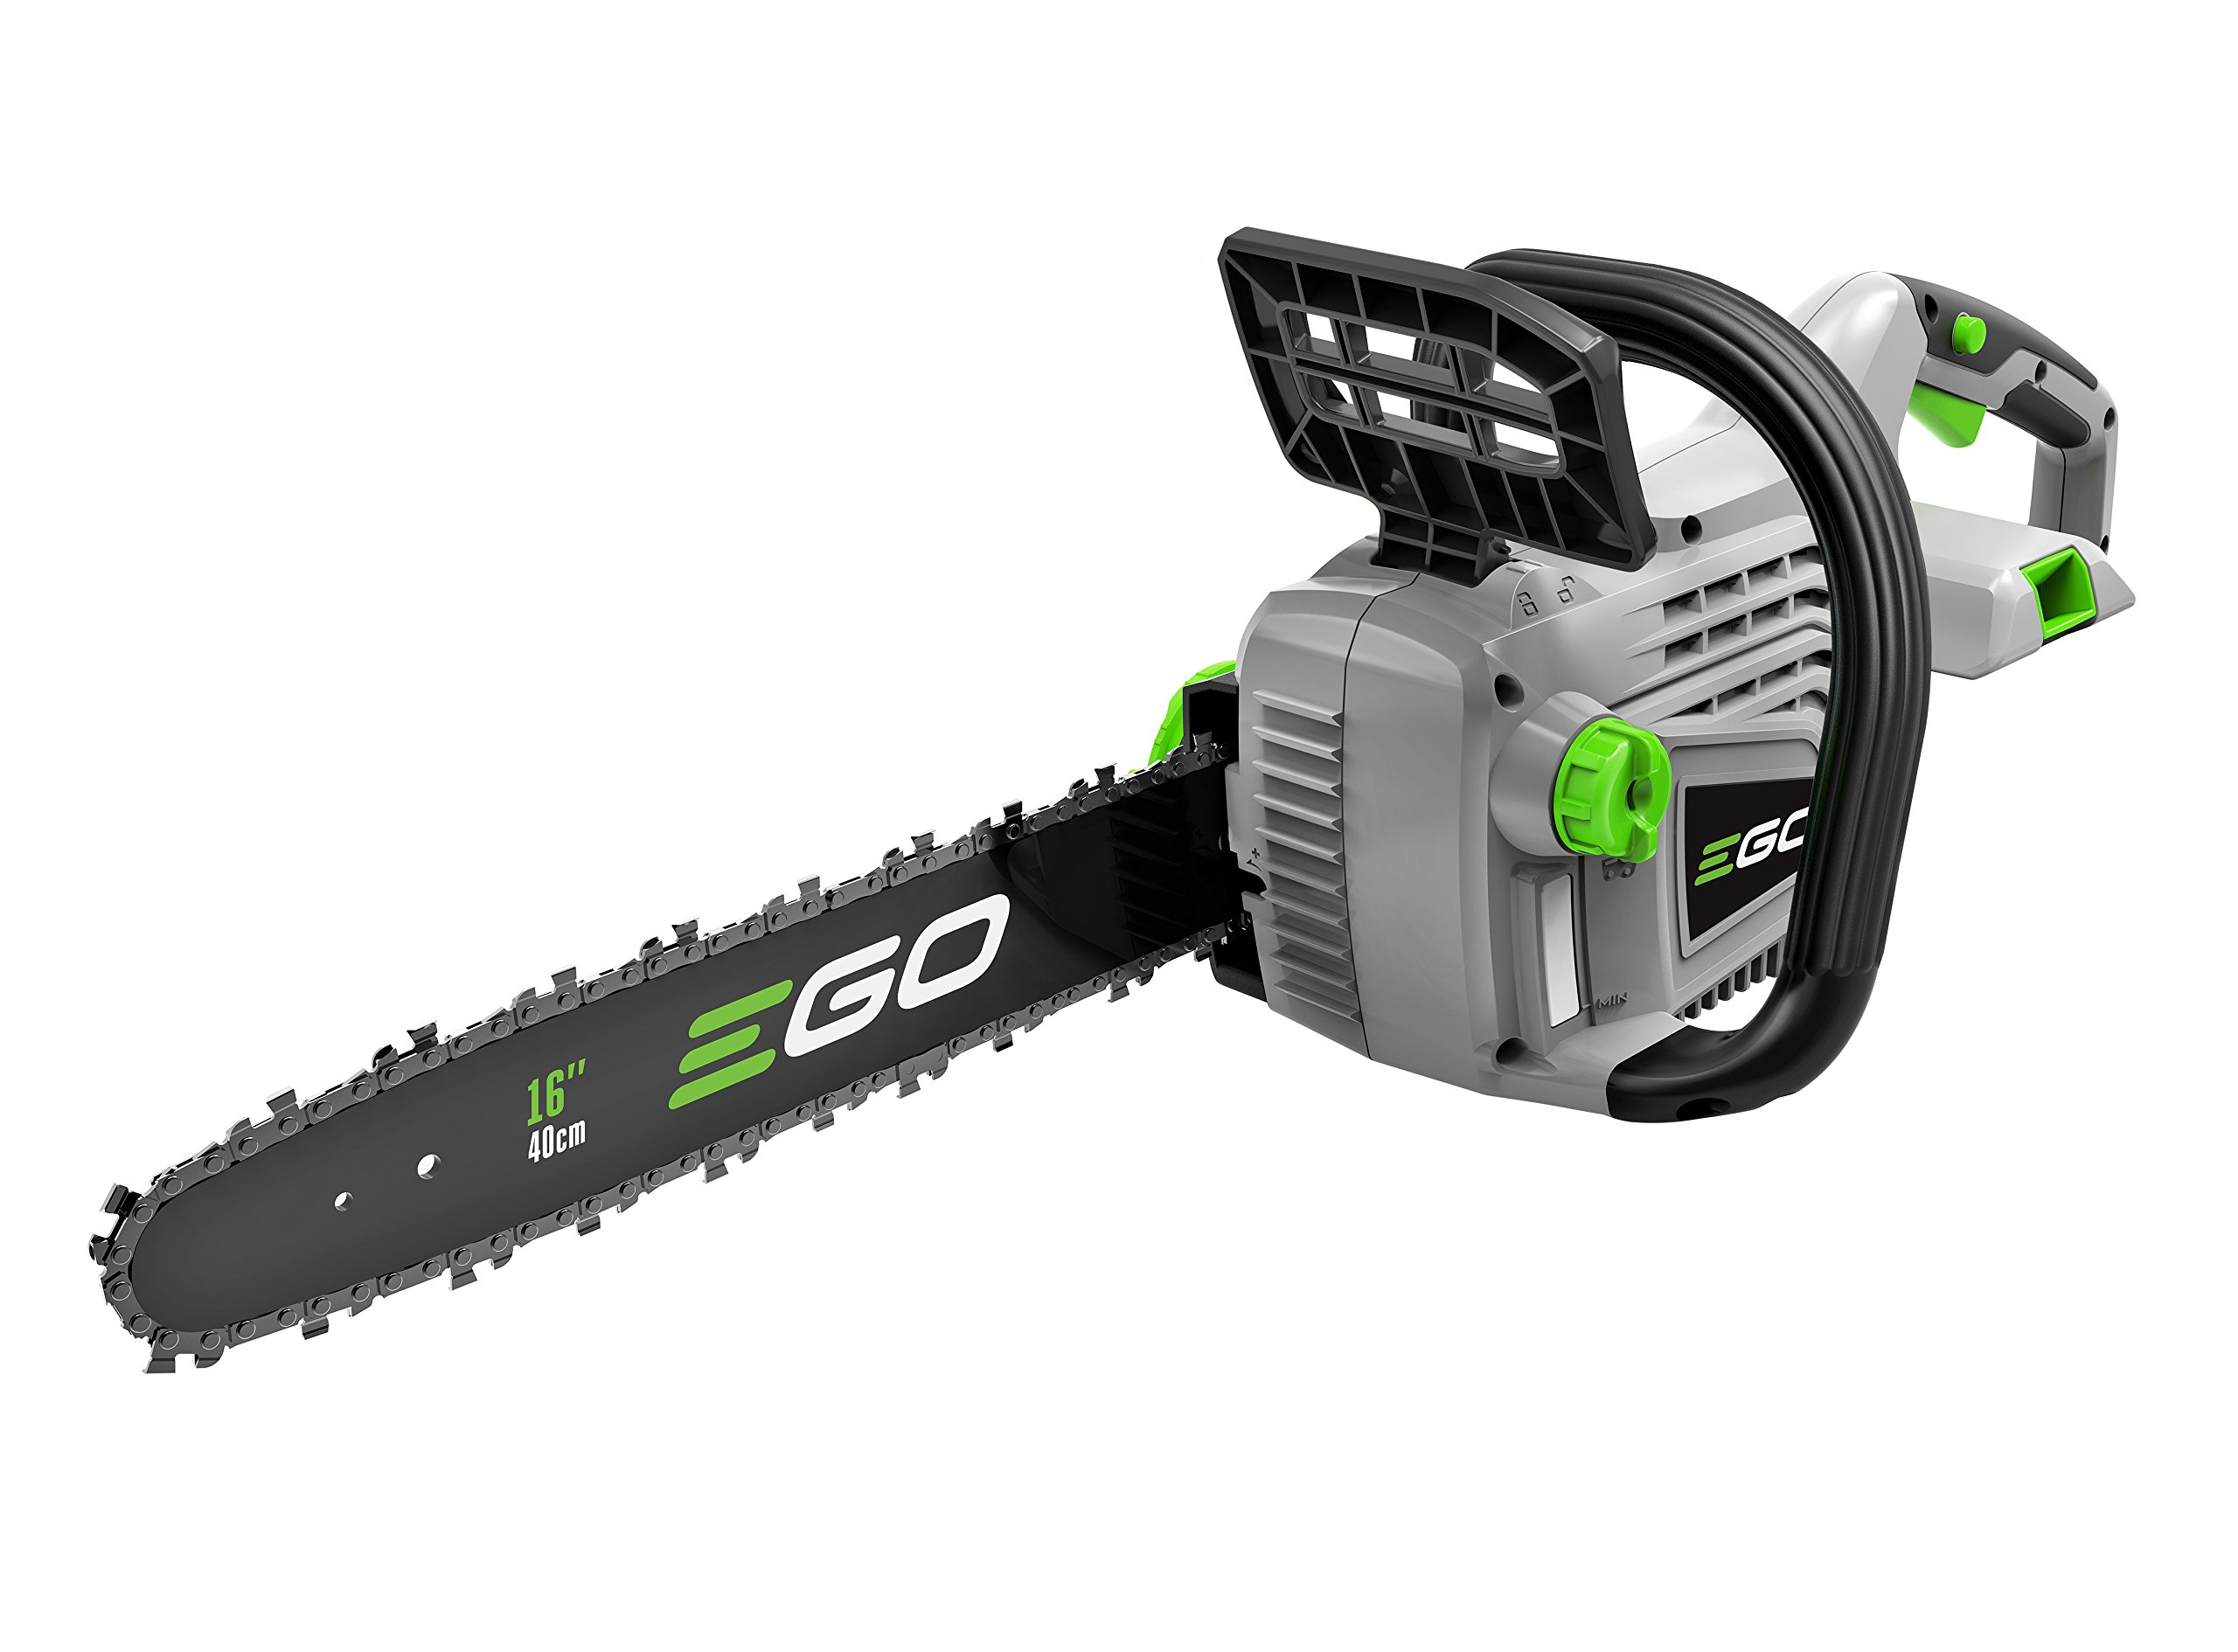 EGO Power+ CS1600 56V Li-Ion Cordless 16'' Brushless Chain Saw Bare Tool by EGO Power+ (Image #1)